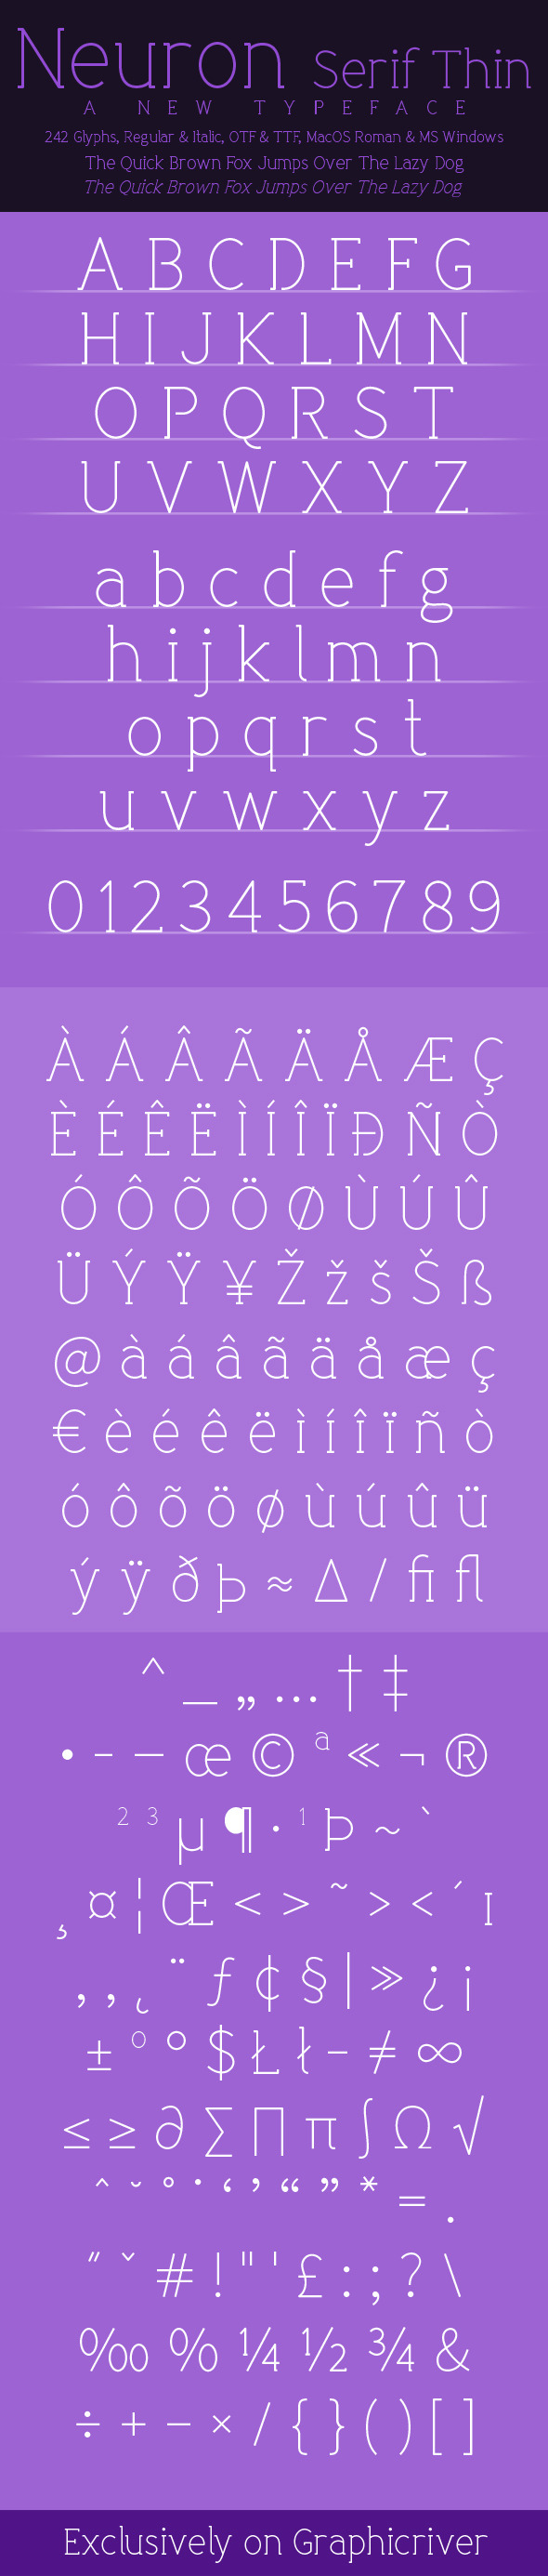 Neuron Serif Thin - Serif Fonts